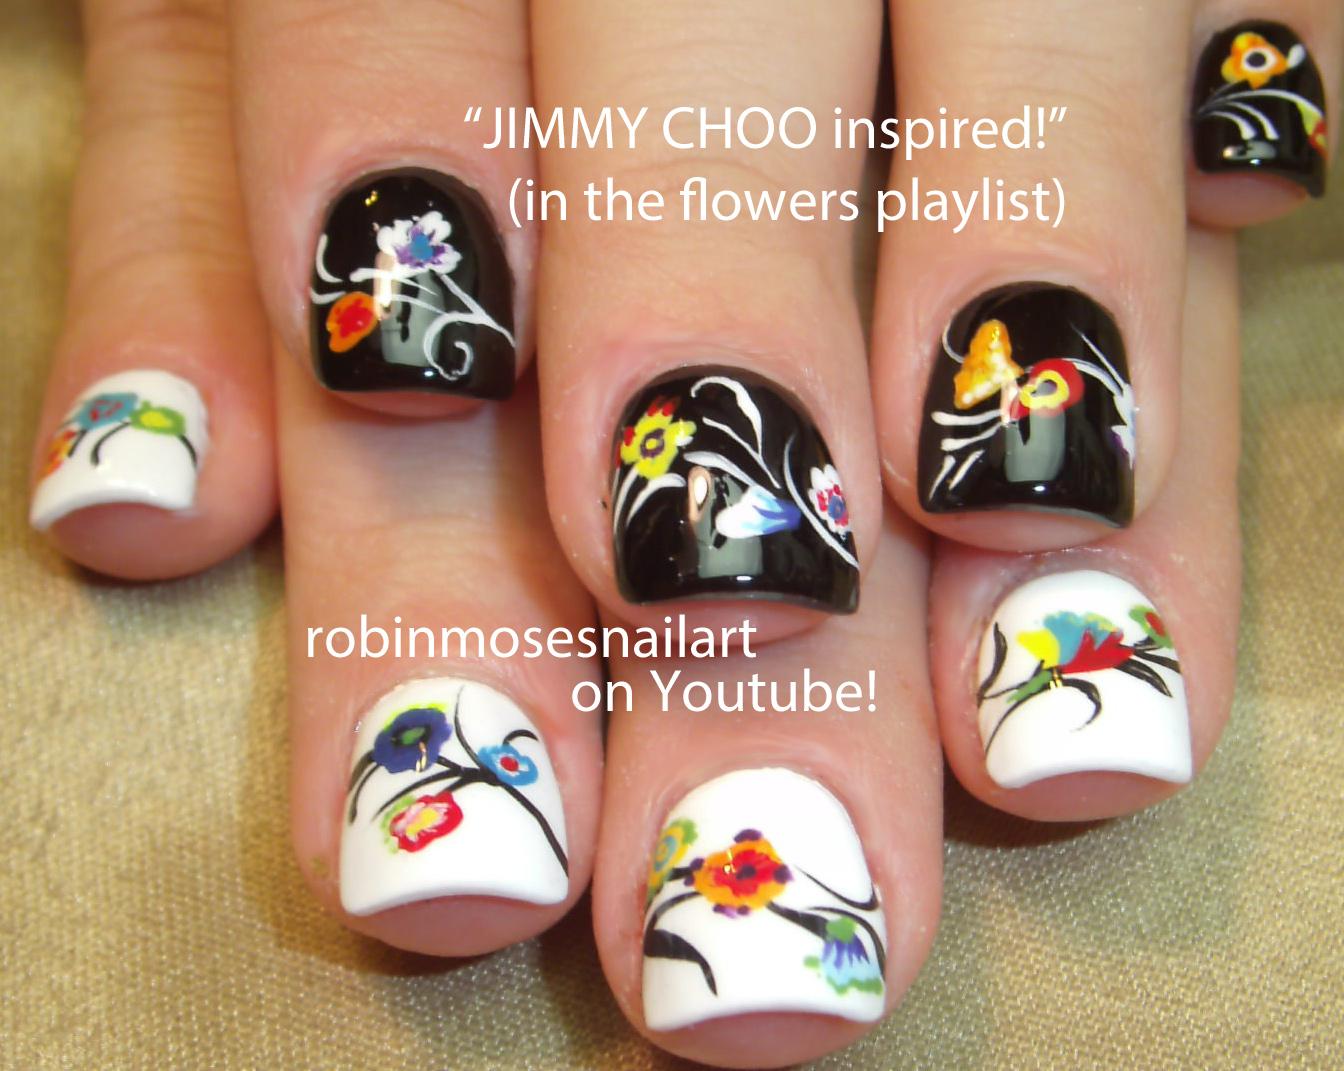 Jimmy Choo Nail Art, Folk Nail Art, Baby Pink Leopard Nail Art ...